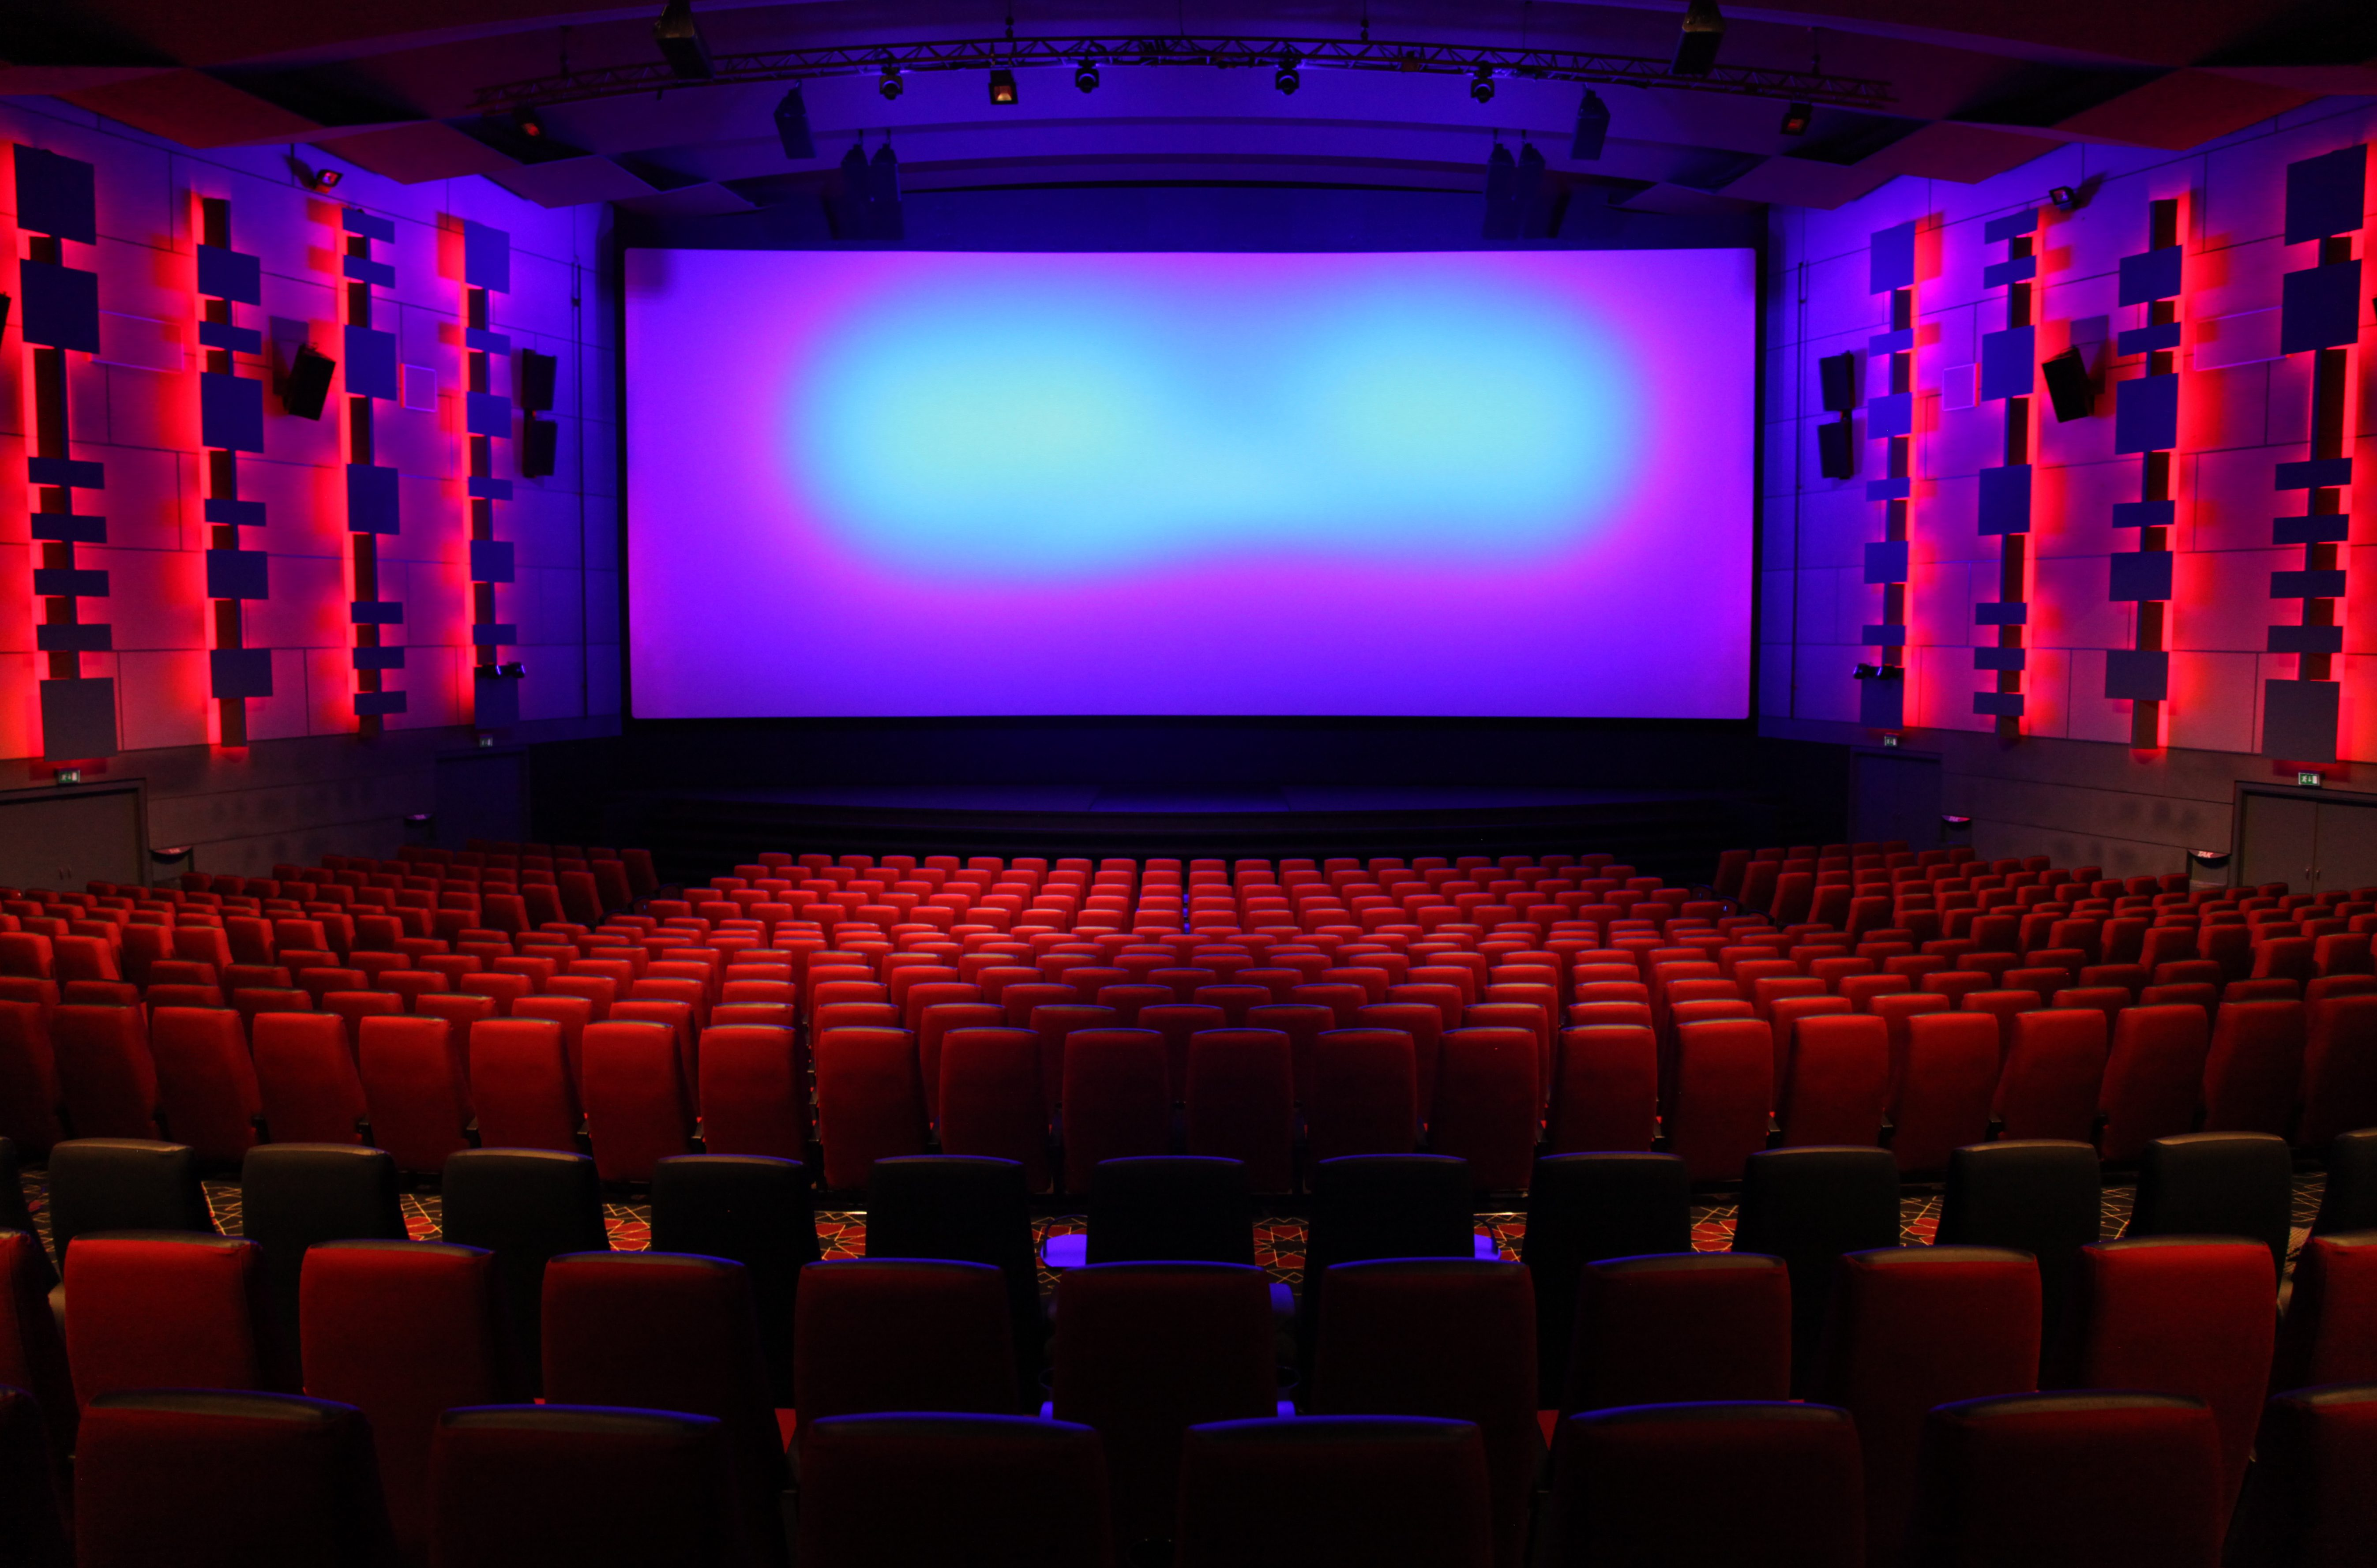 verdens smukkeste bryster biografer i Odense